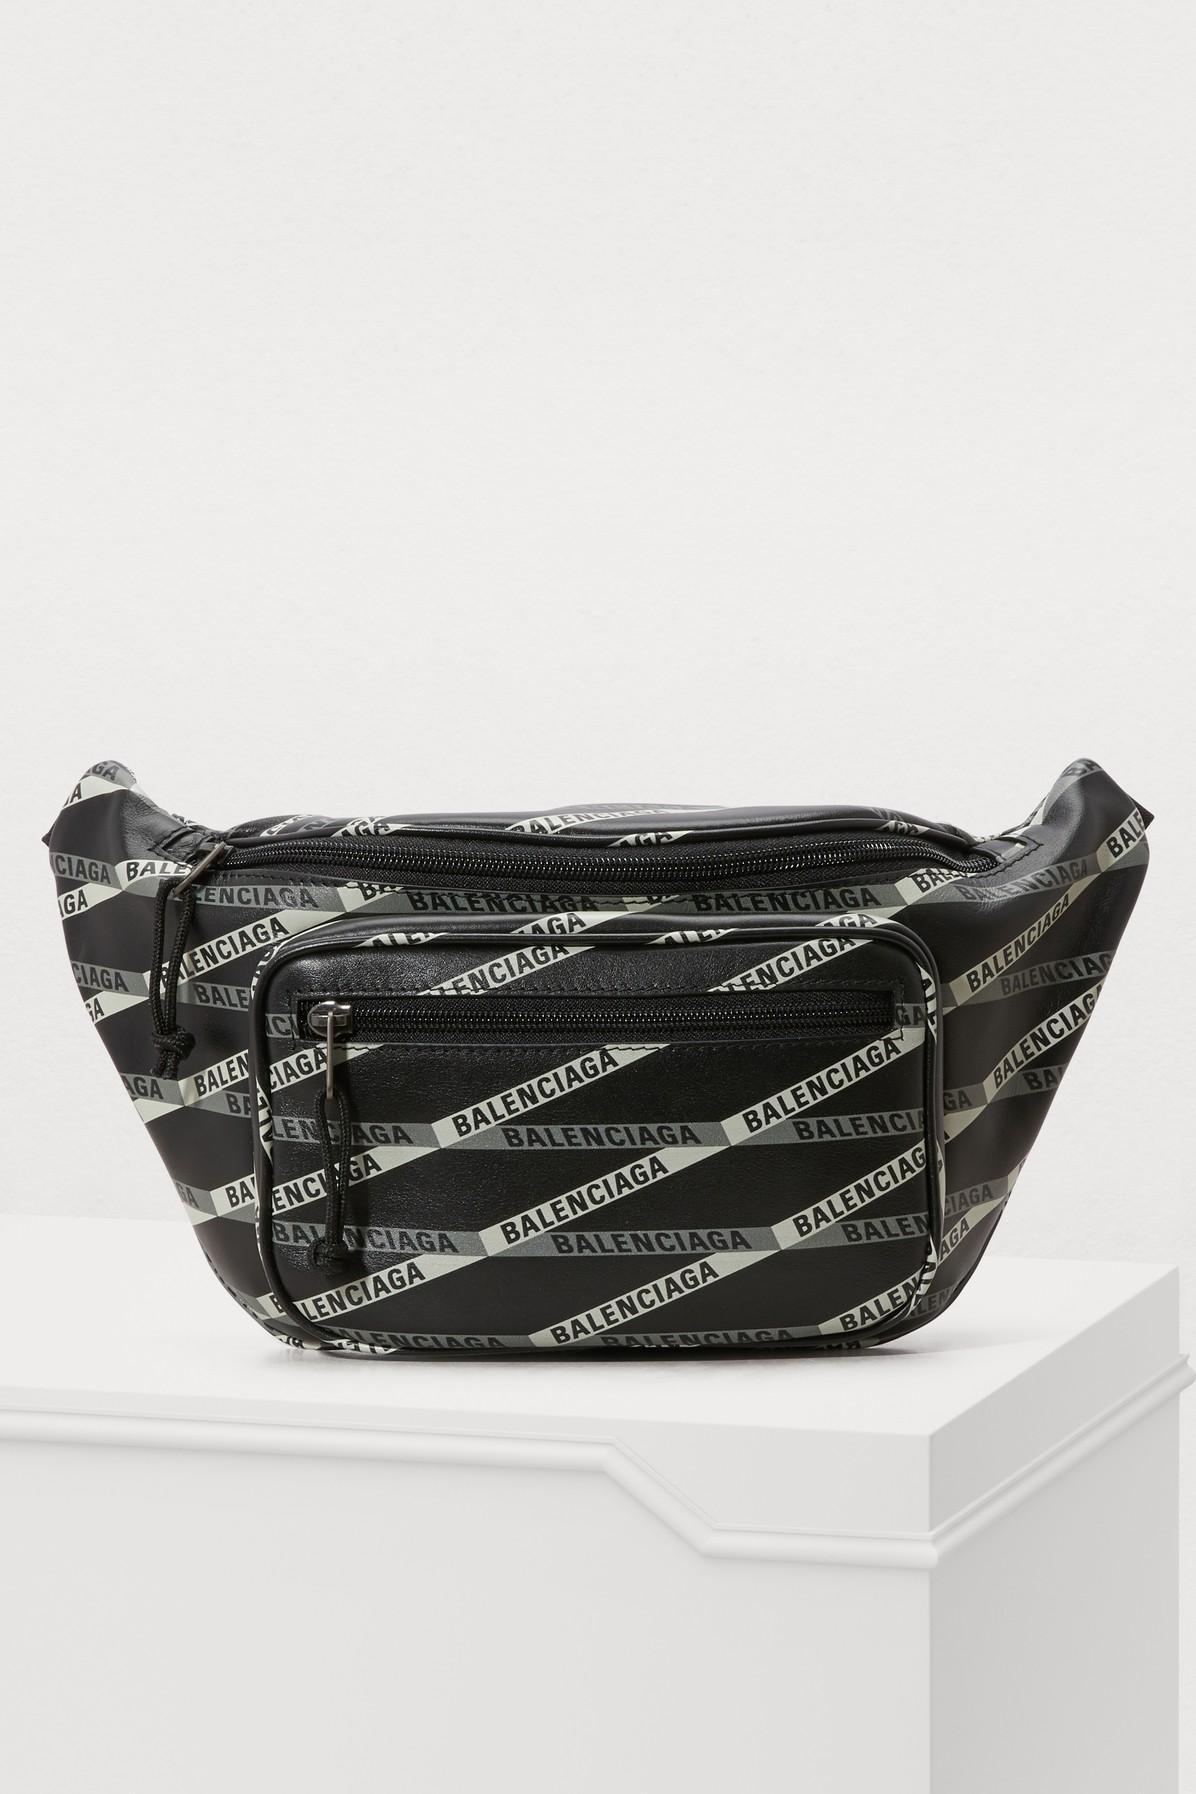 balenciaga belt bag price